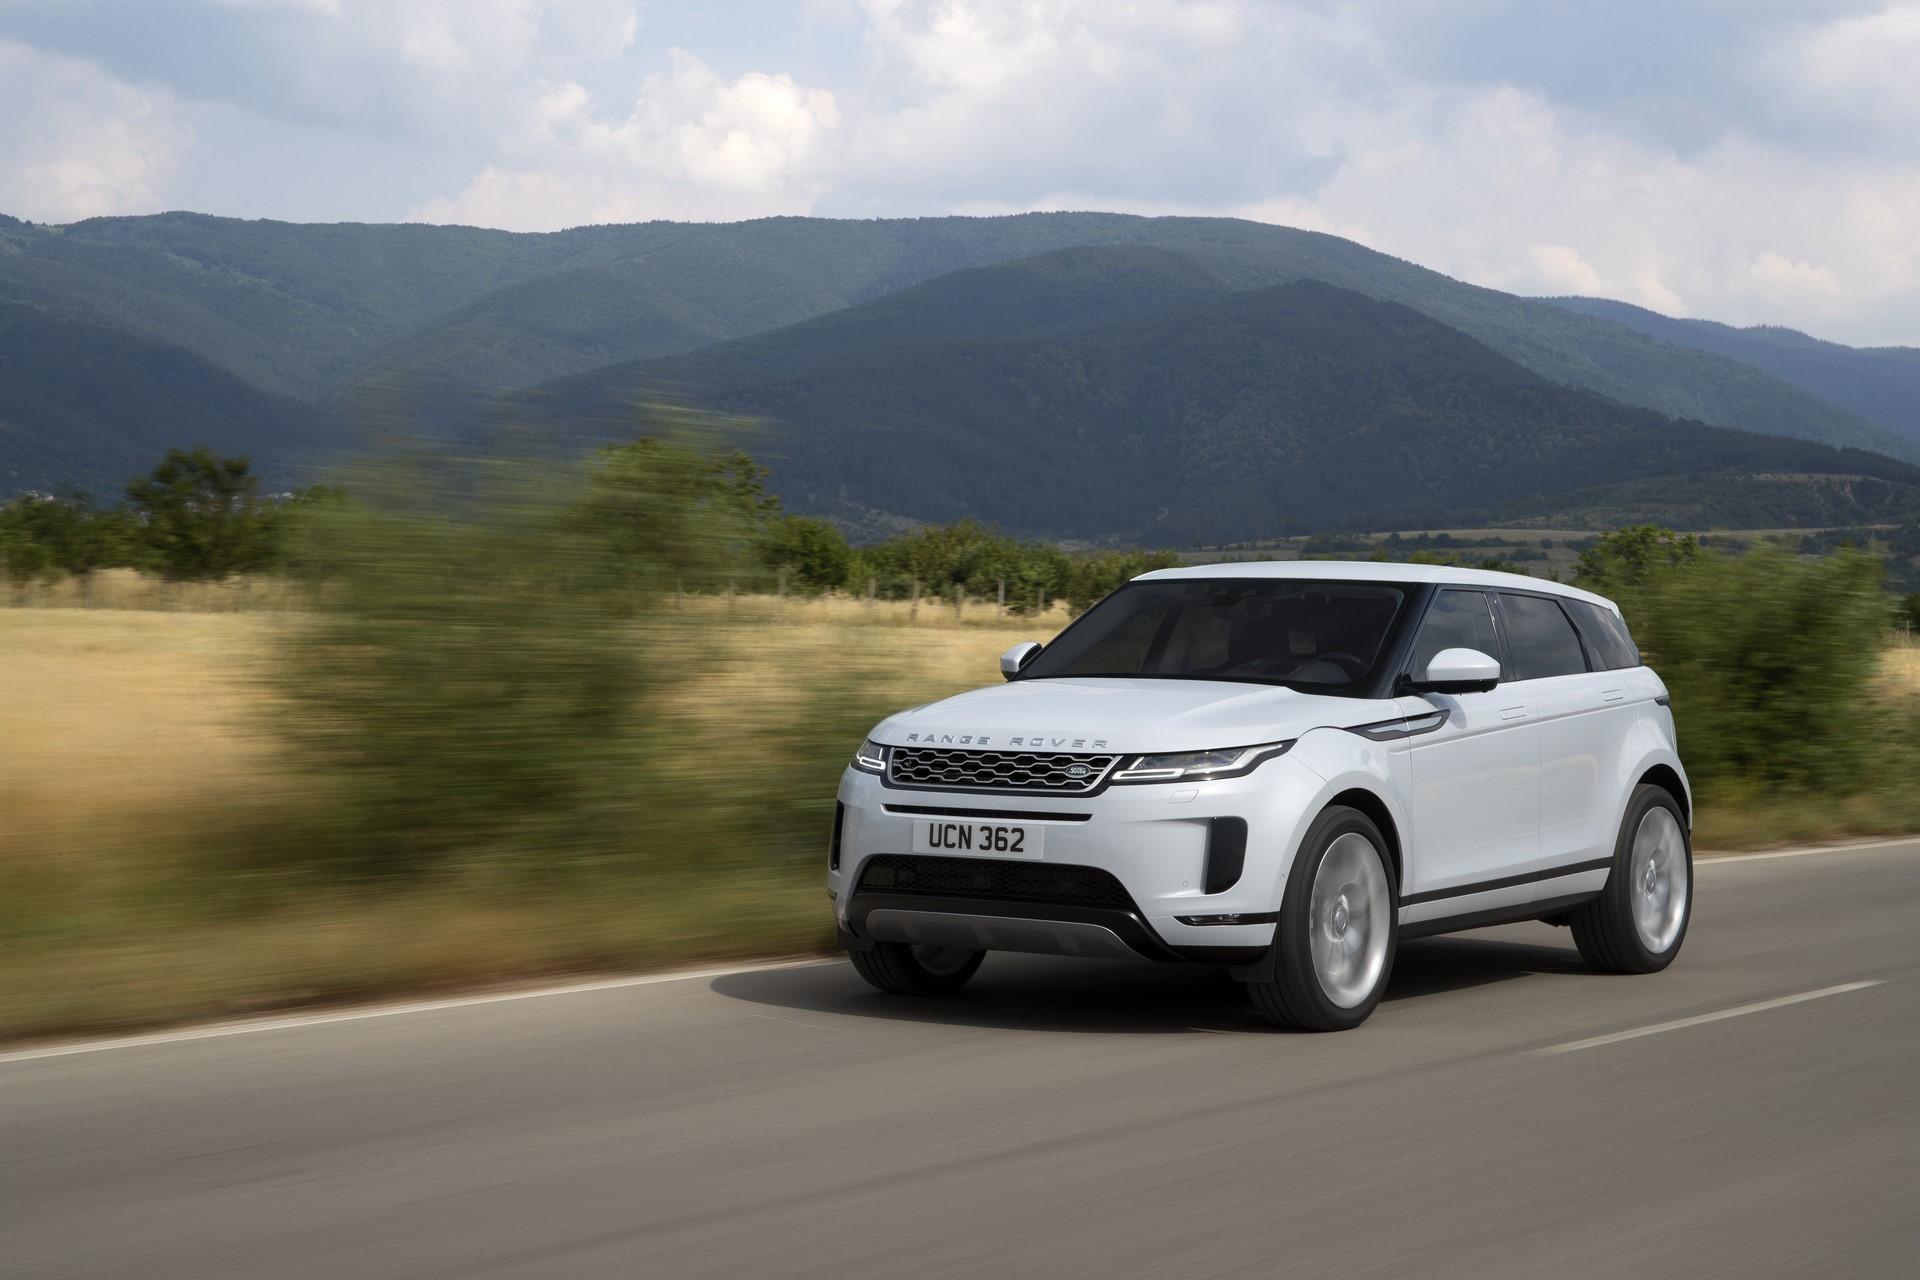 Range Rover Evoque 2019 (41)